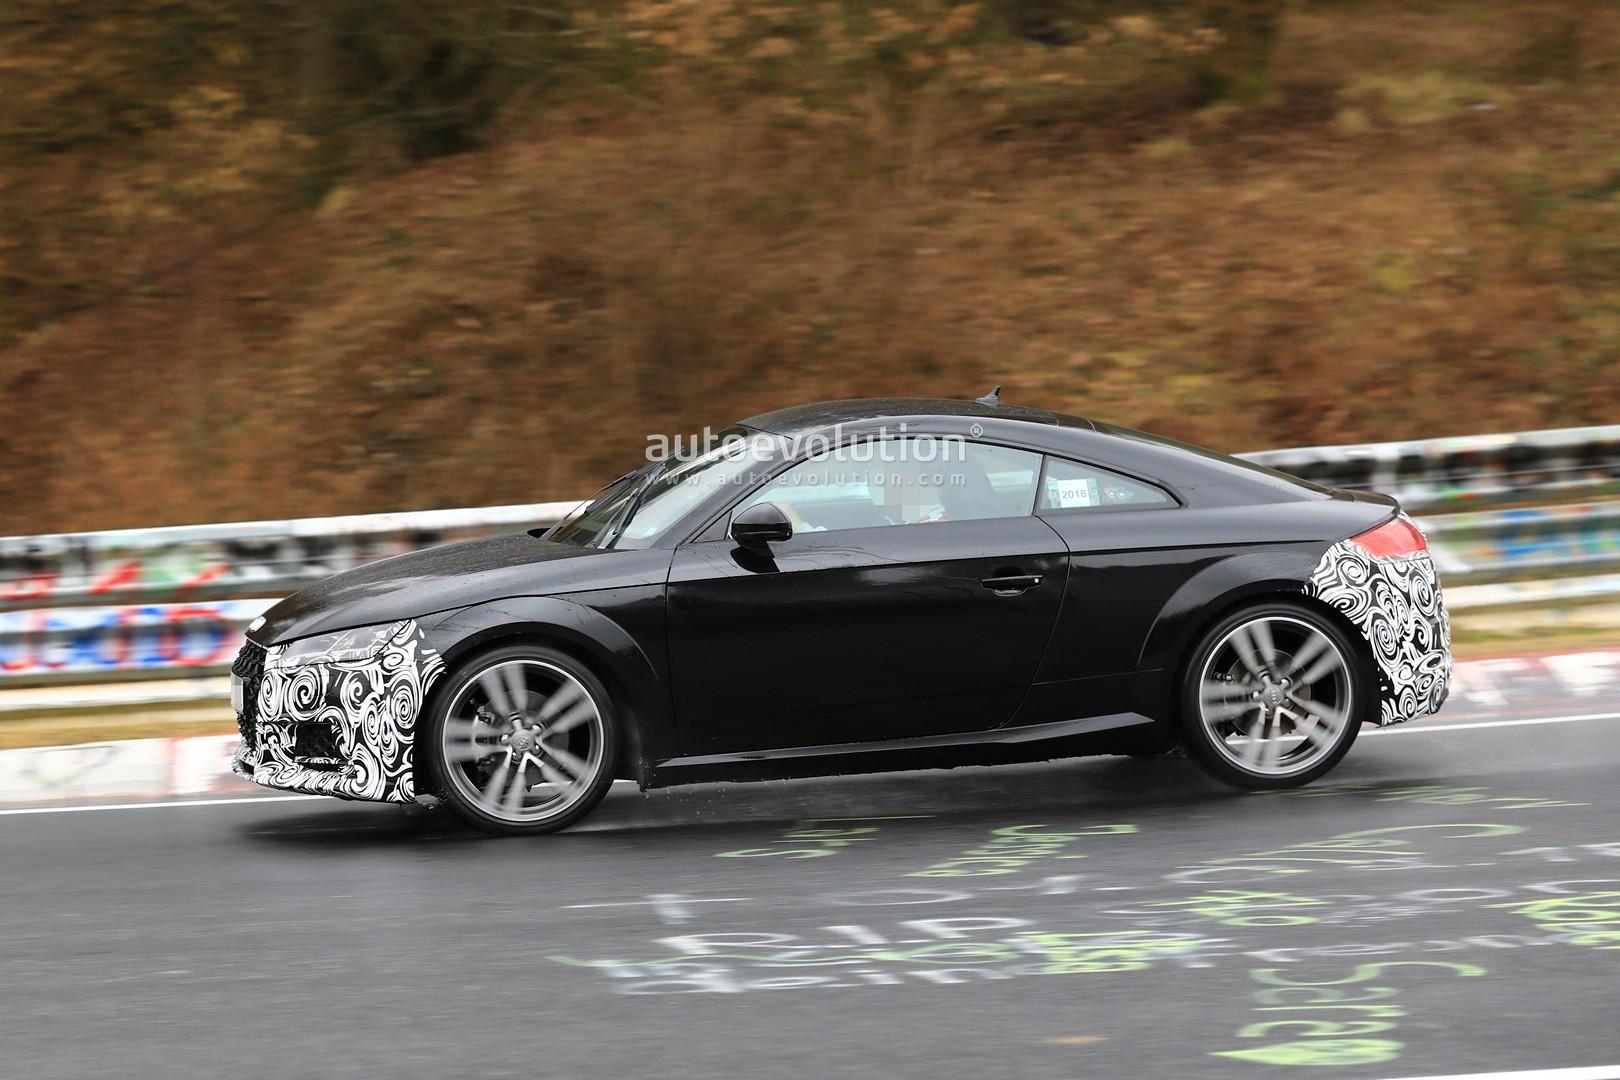 Spyshots 2019 Audi Tt Facelift Spotted Testing On The